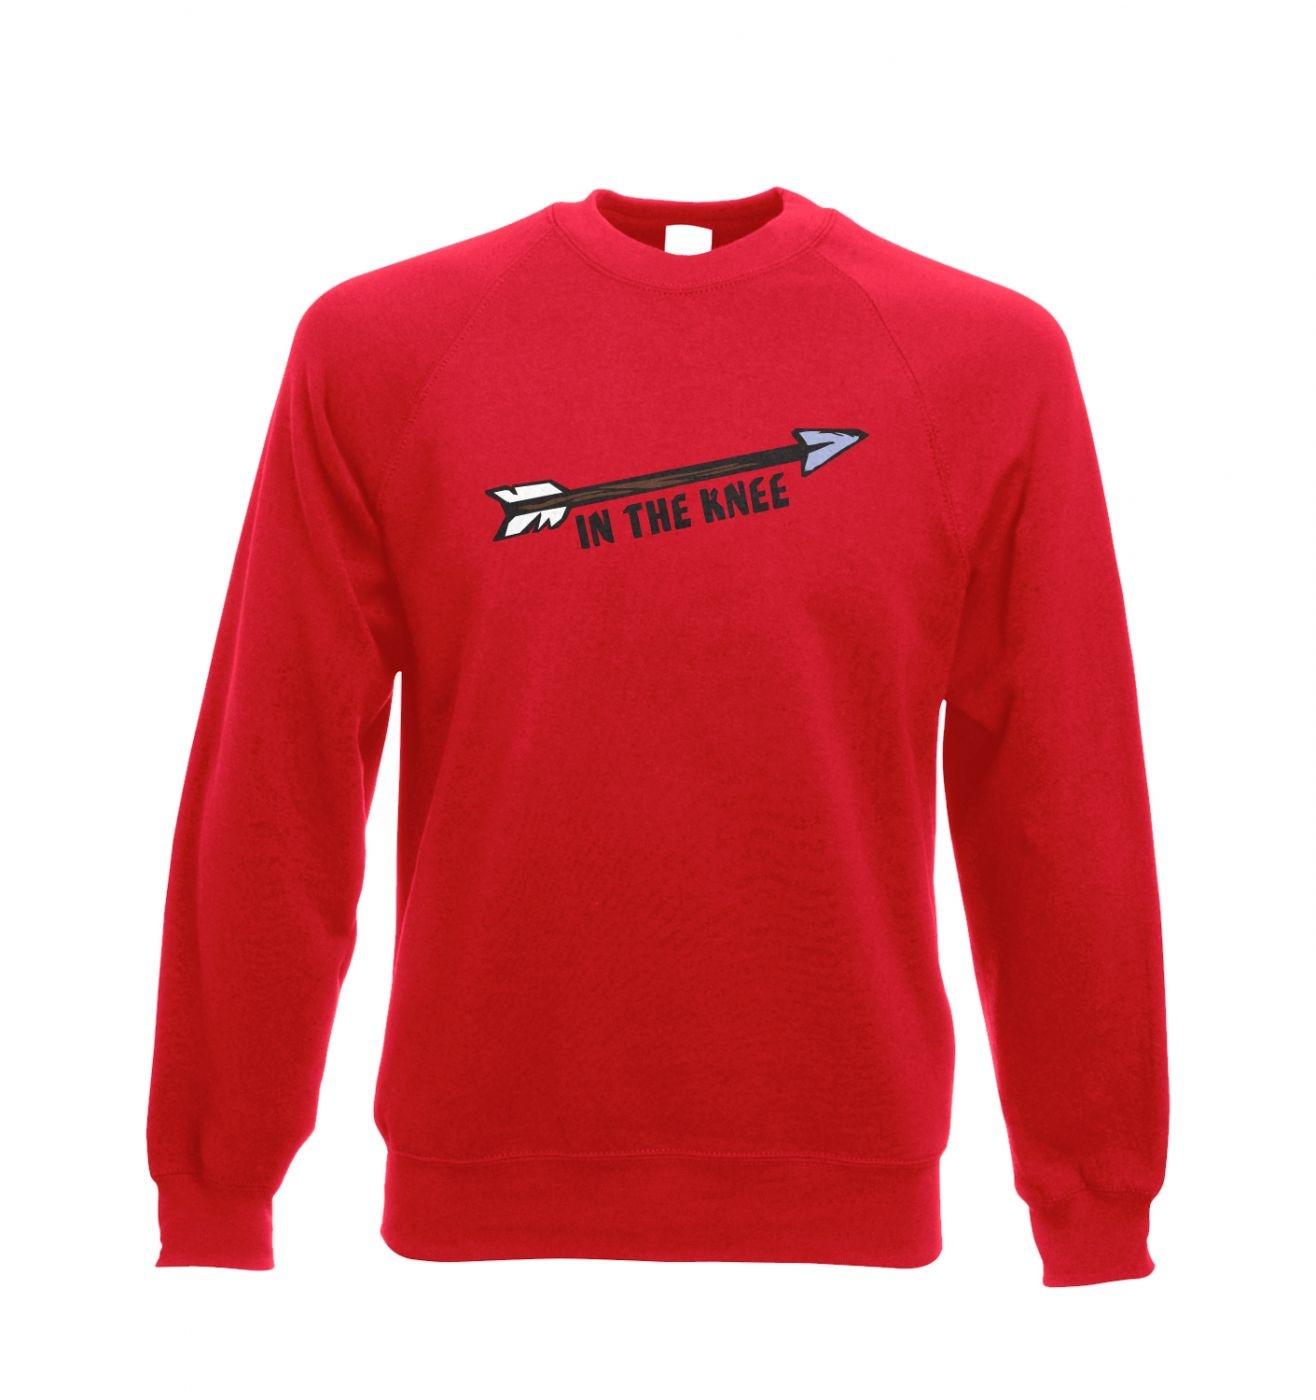 Cartoon Arrow In The Knee crewneck sweatshirt